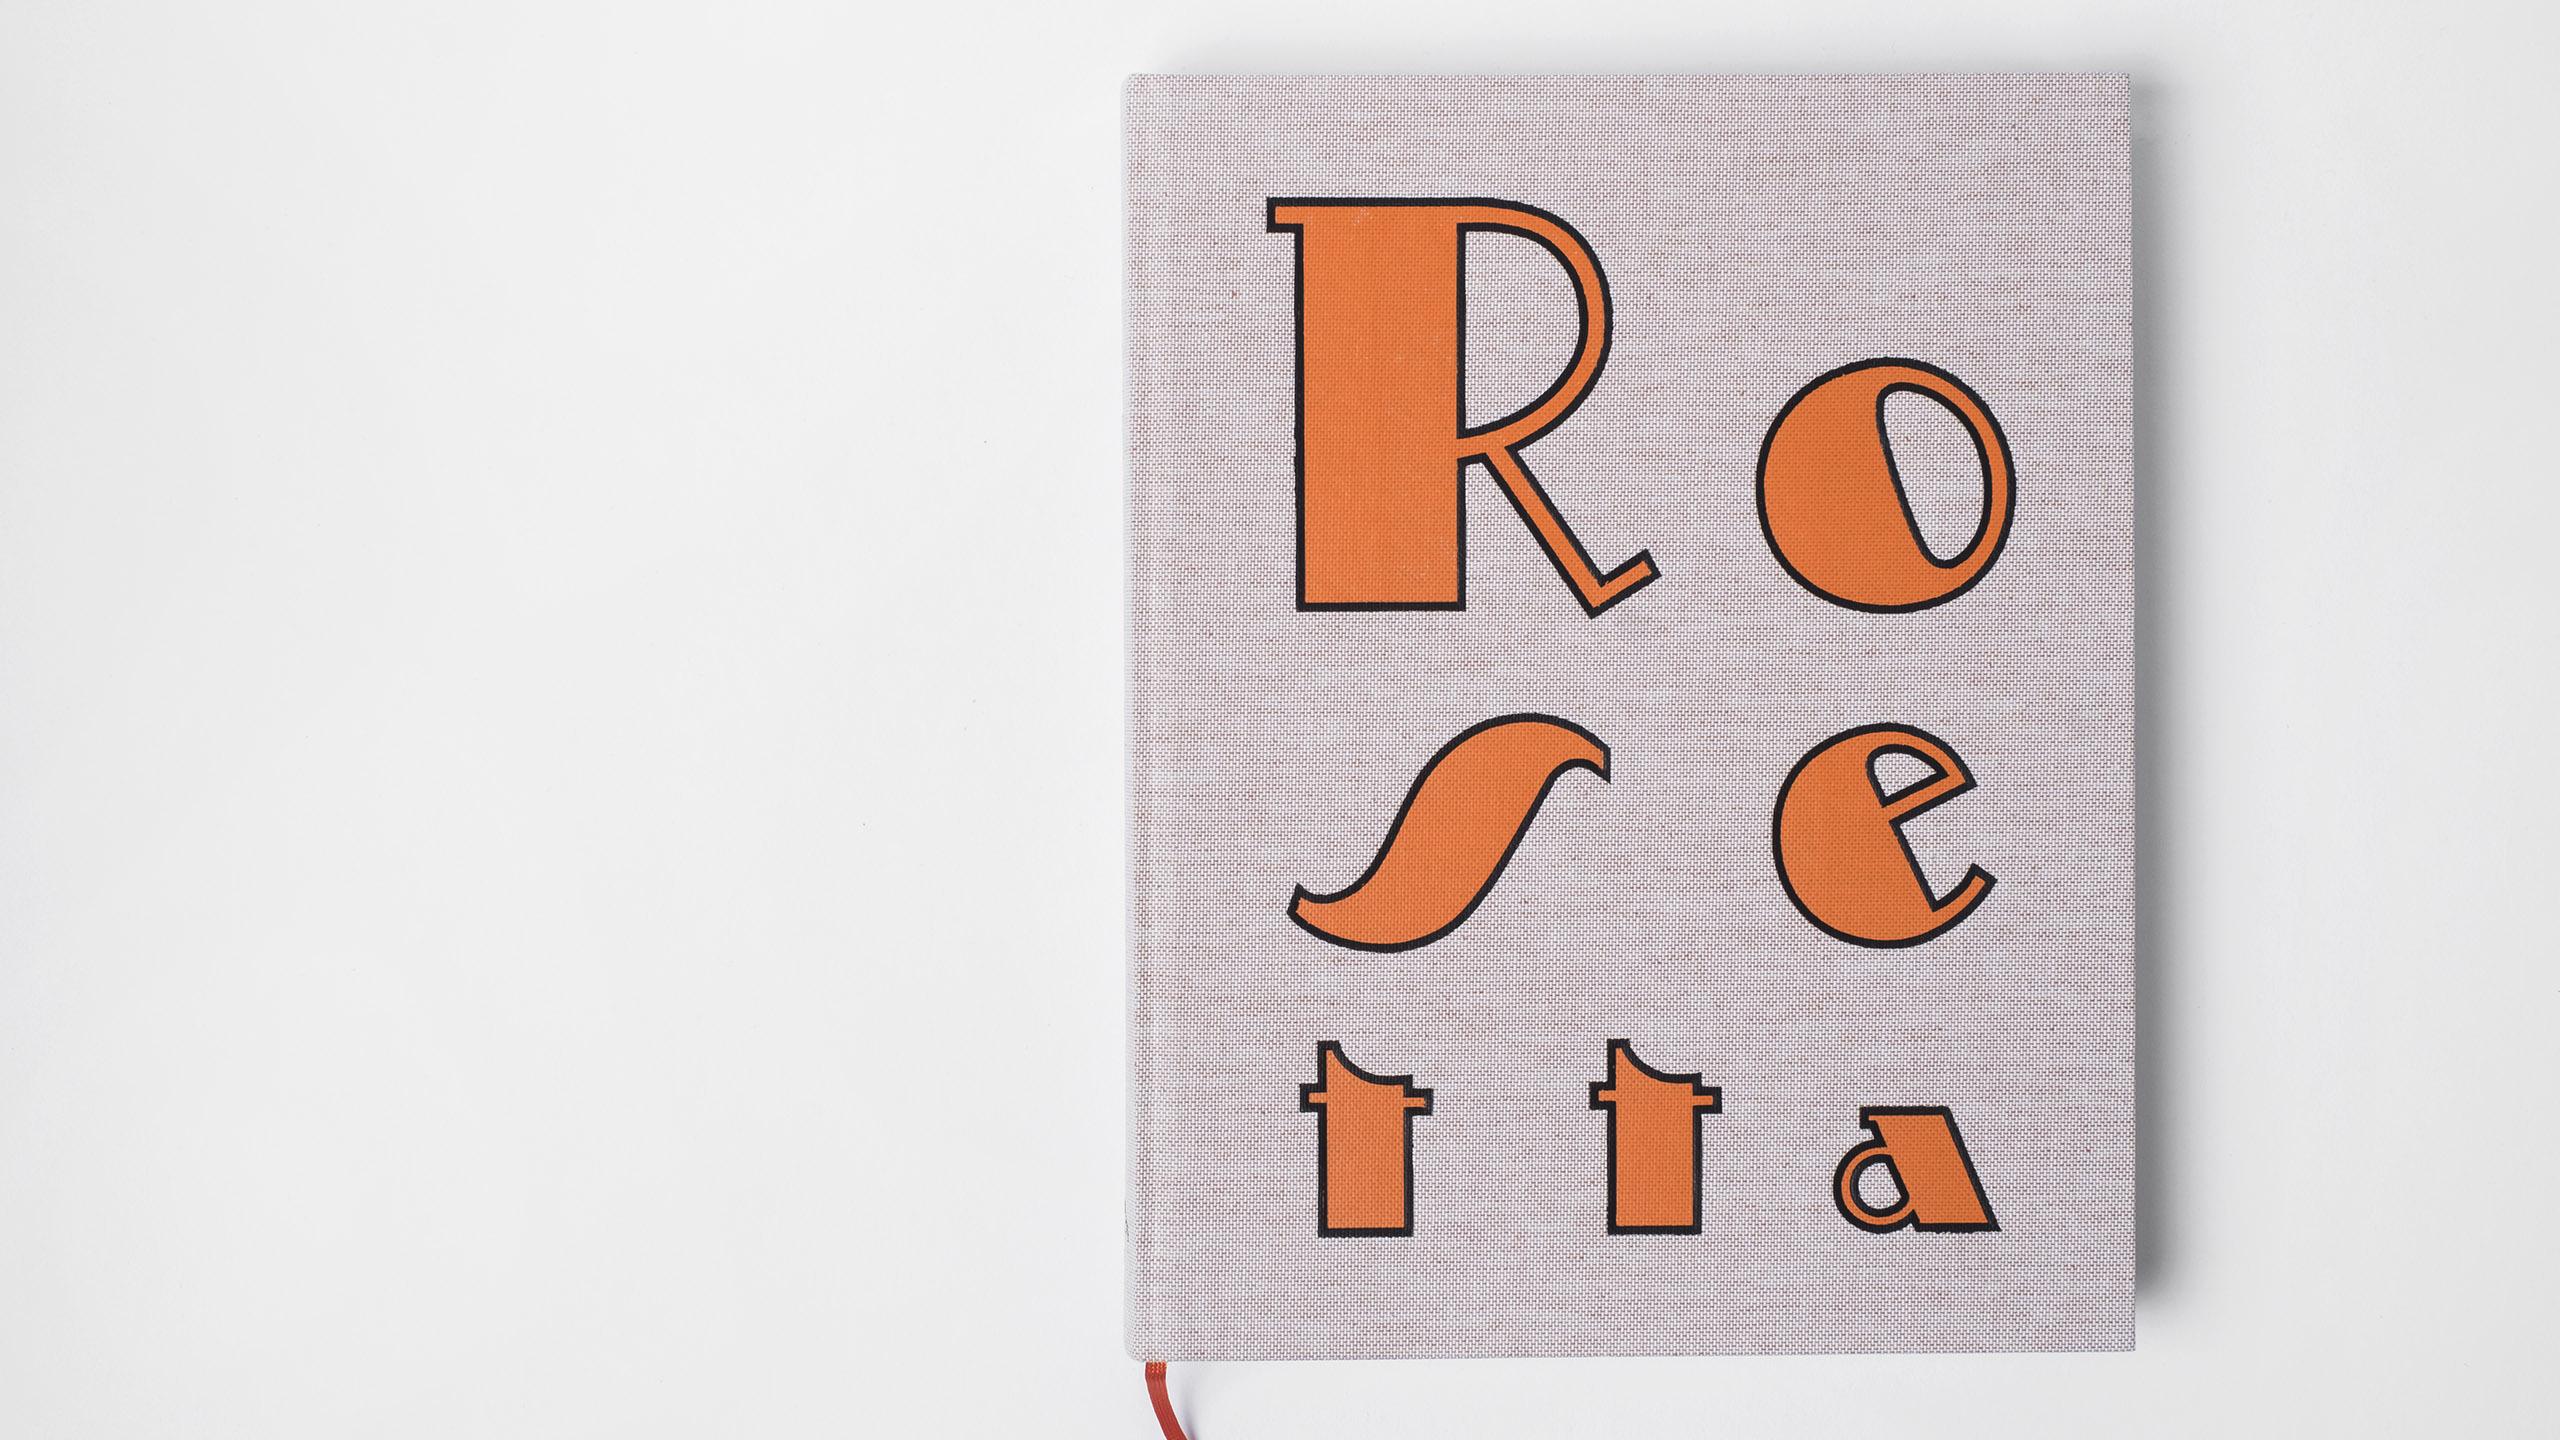 Elena Reygadas lanza su primer libro: Rosetta